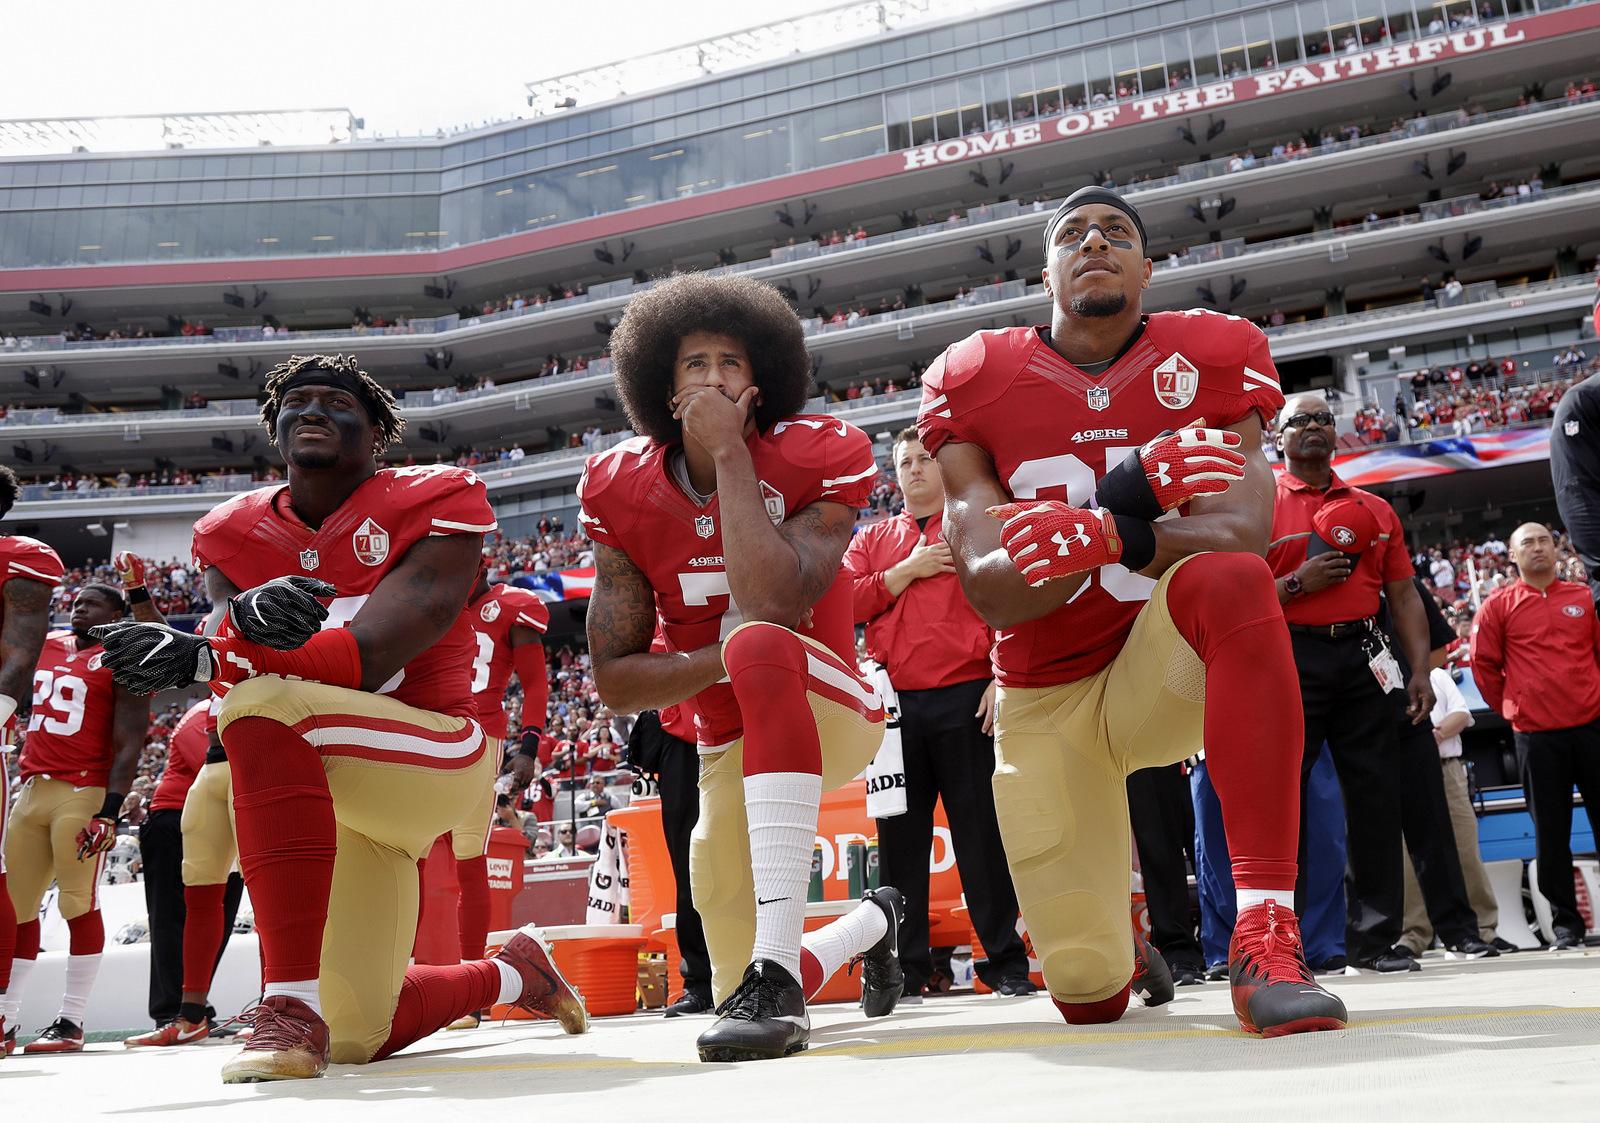 San Francisco 49ers outside linebacker Eli Harold, quarterback Colin Kaepernick and safety Eric Reid kneel during the national anthem before an NFL football game against the Dallas Cowboys in Santa Clara, Calif. (AP/Marcio Jose Sanchez)